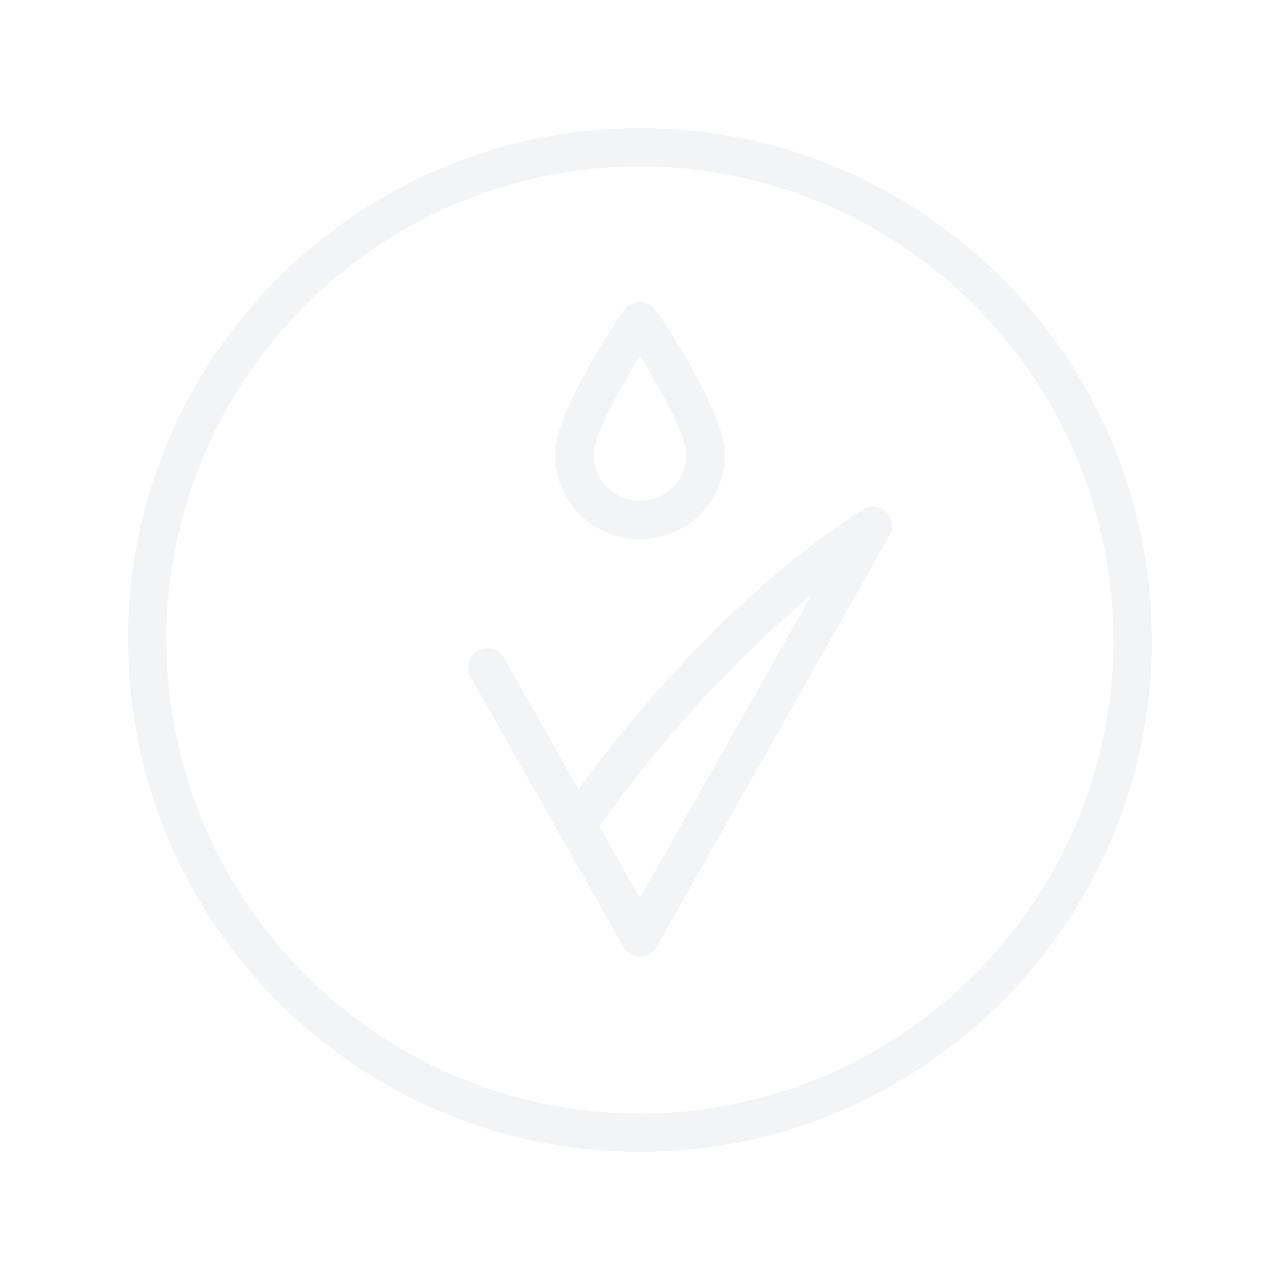 HUXLEY Fresh and More Cream 50ml